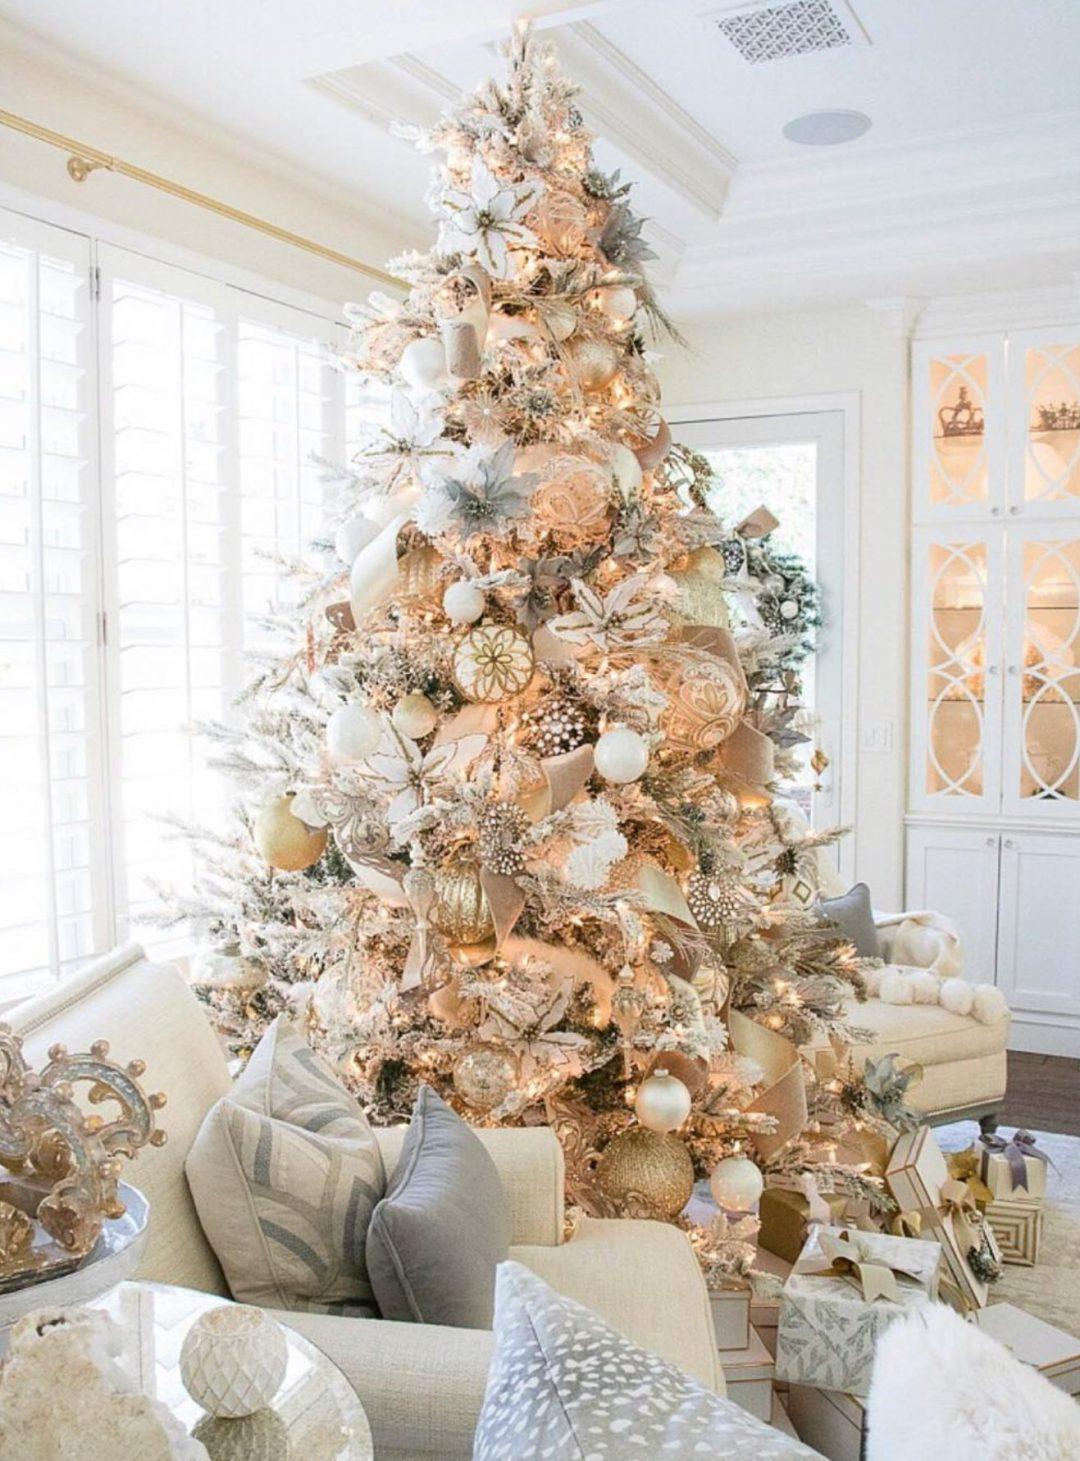 Elegant Christmas tree ideas with gold